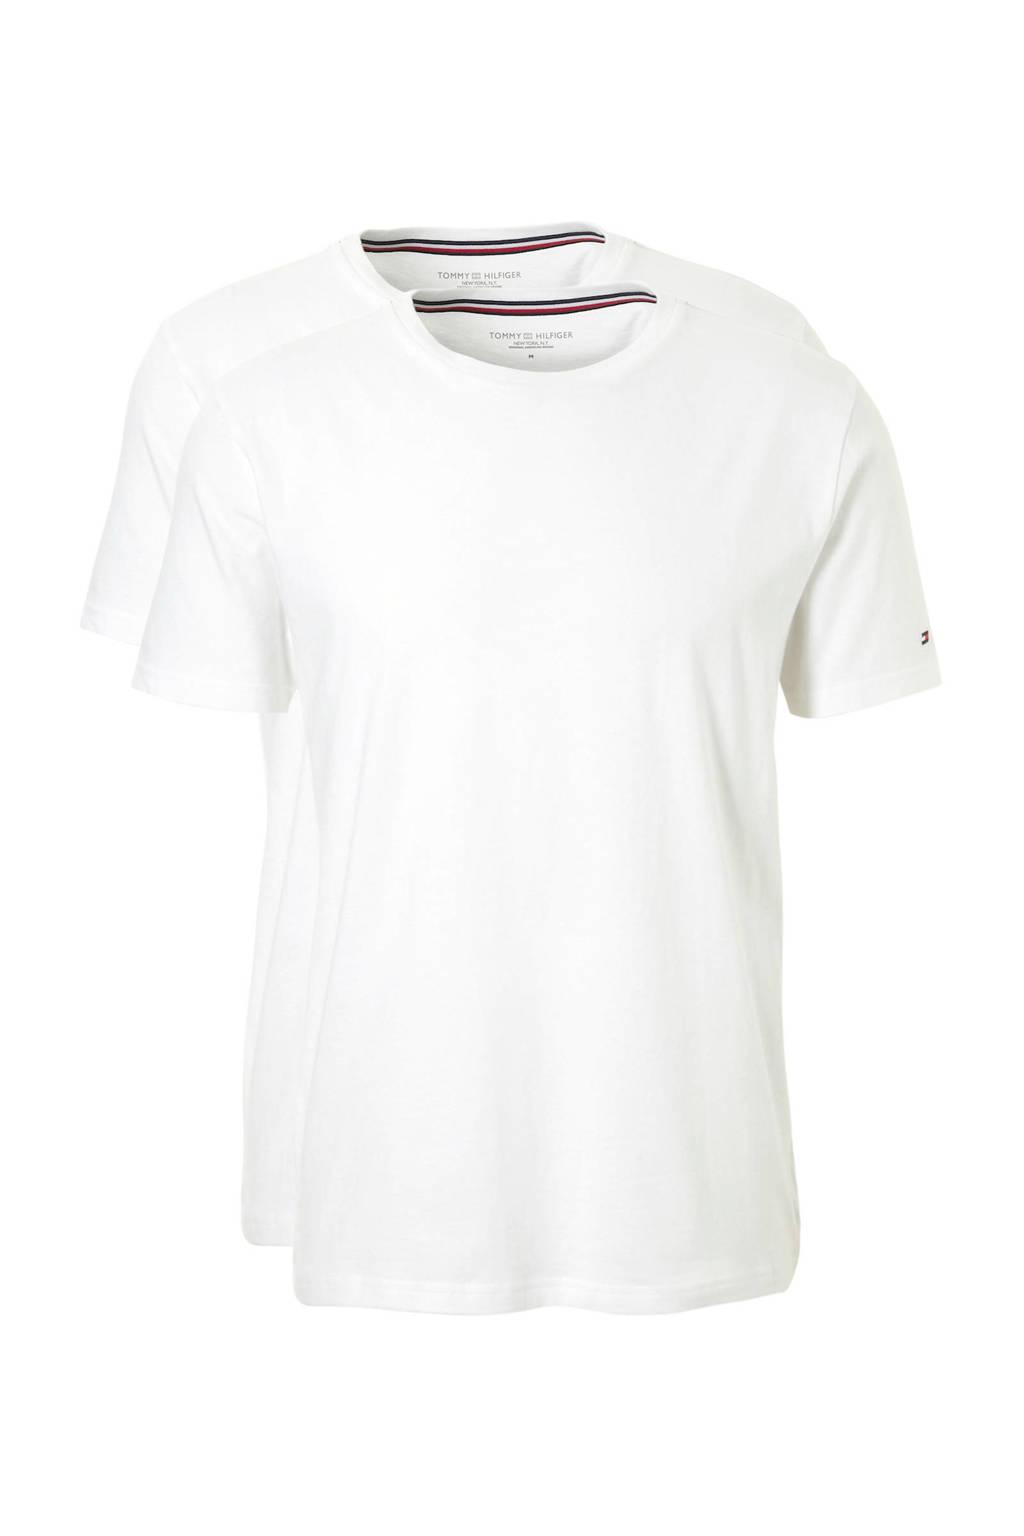 Tommy Hilfiger T-shirt (set van 2), Wit